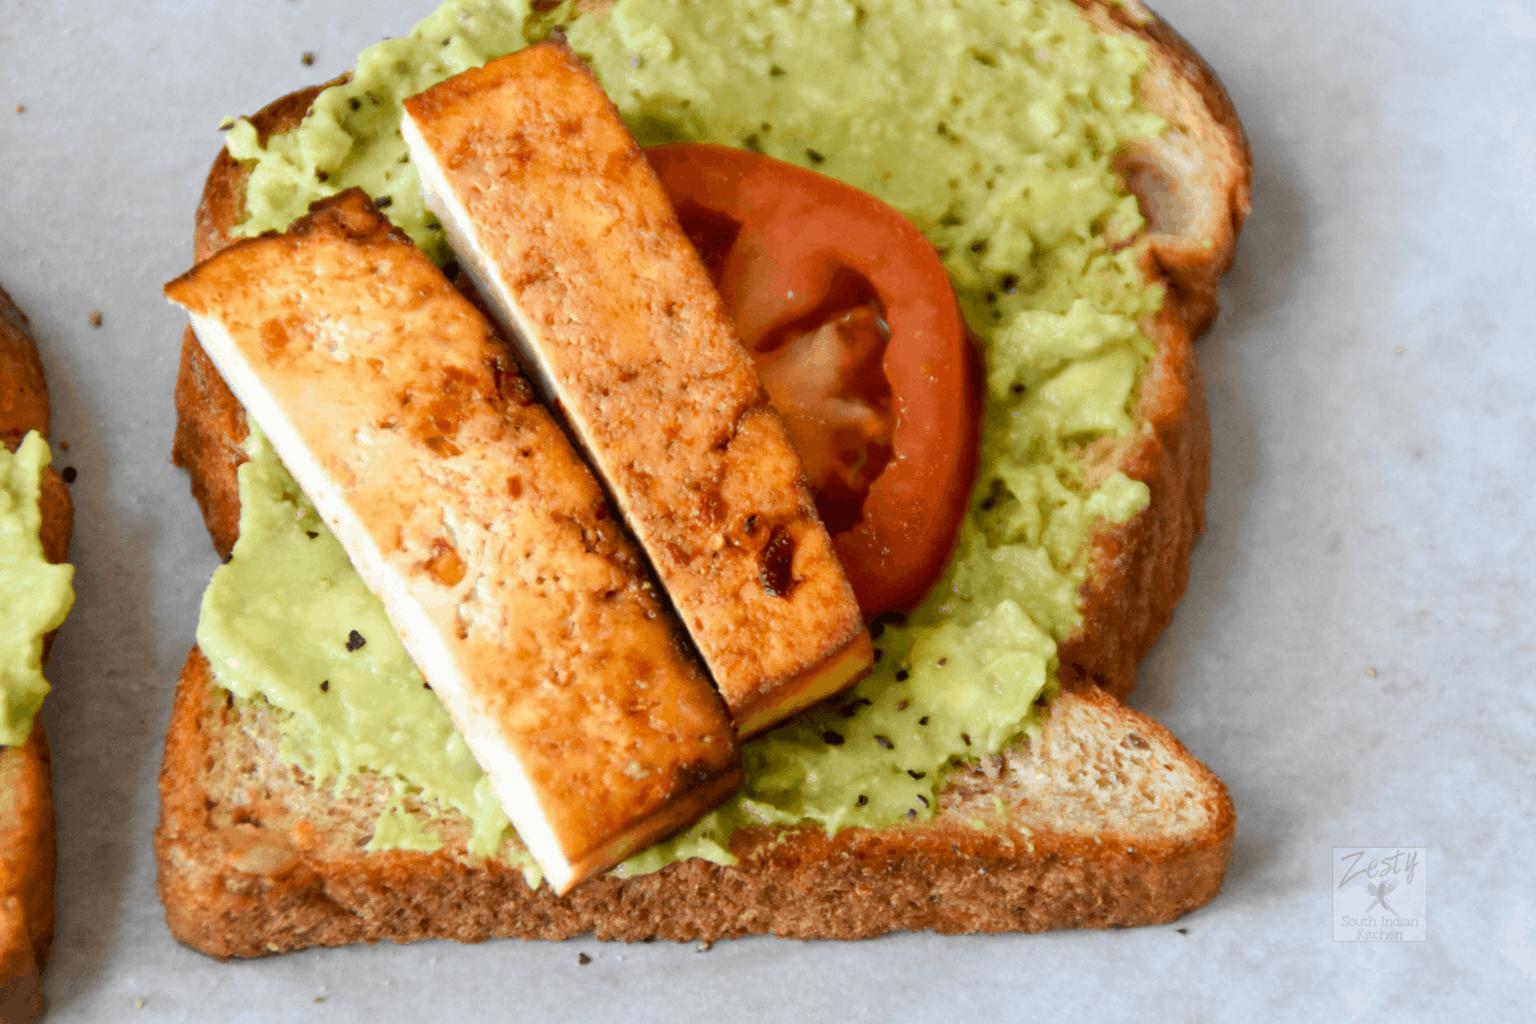 Avocado and Tofu Toasts